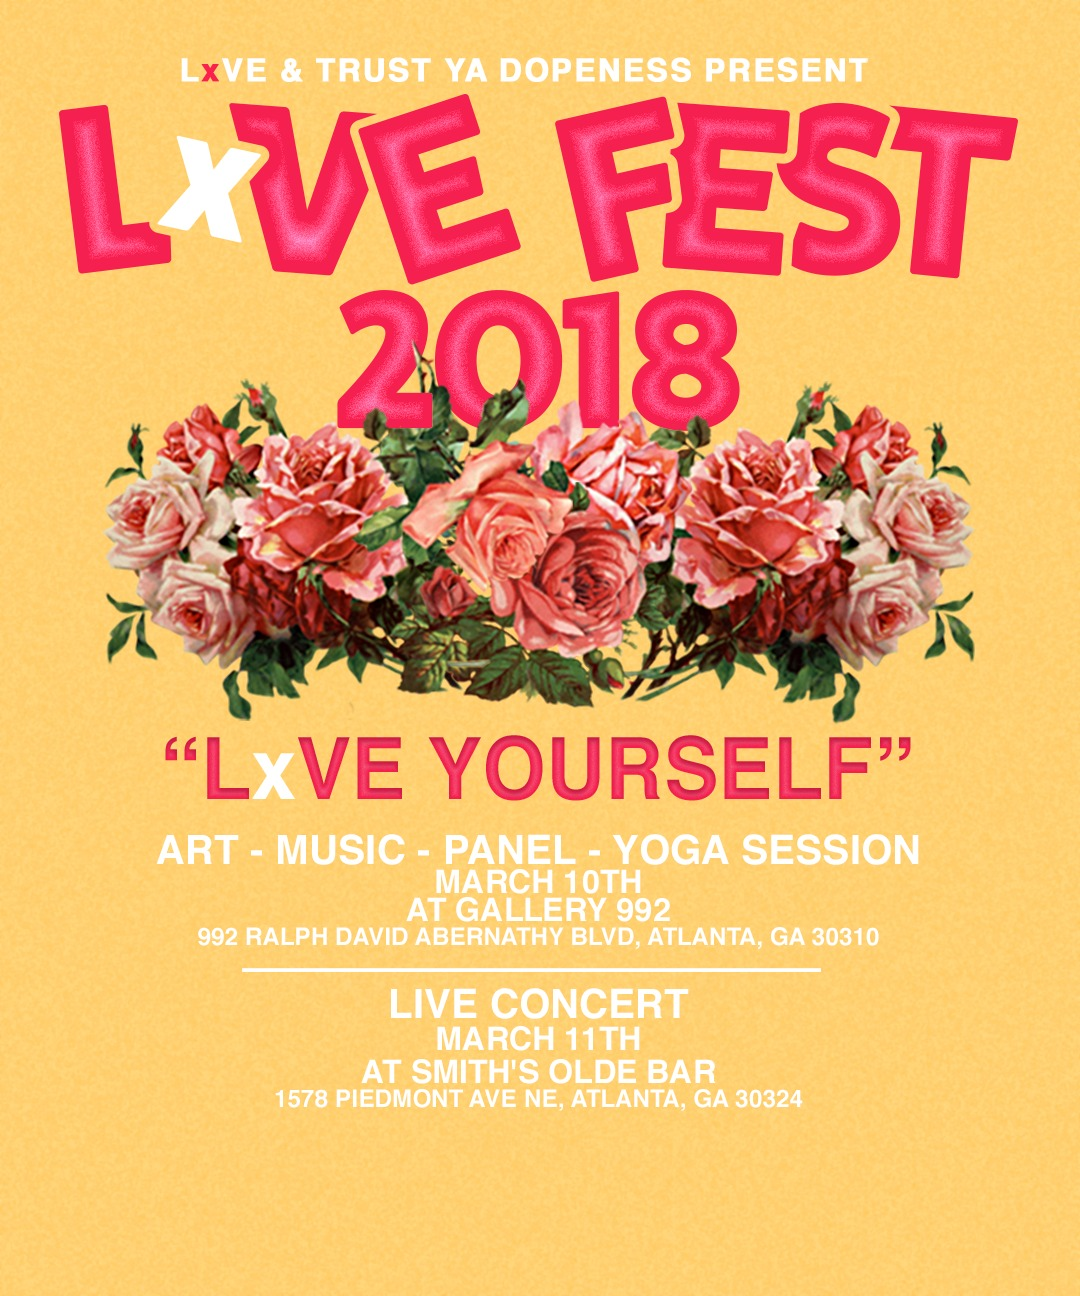 LxVE Fest 2018 general flyer.jpg